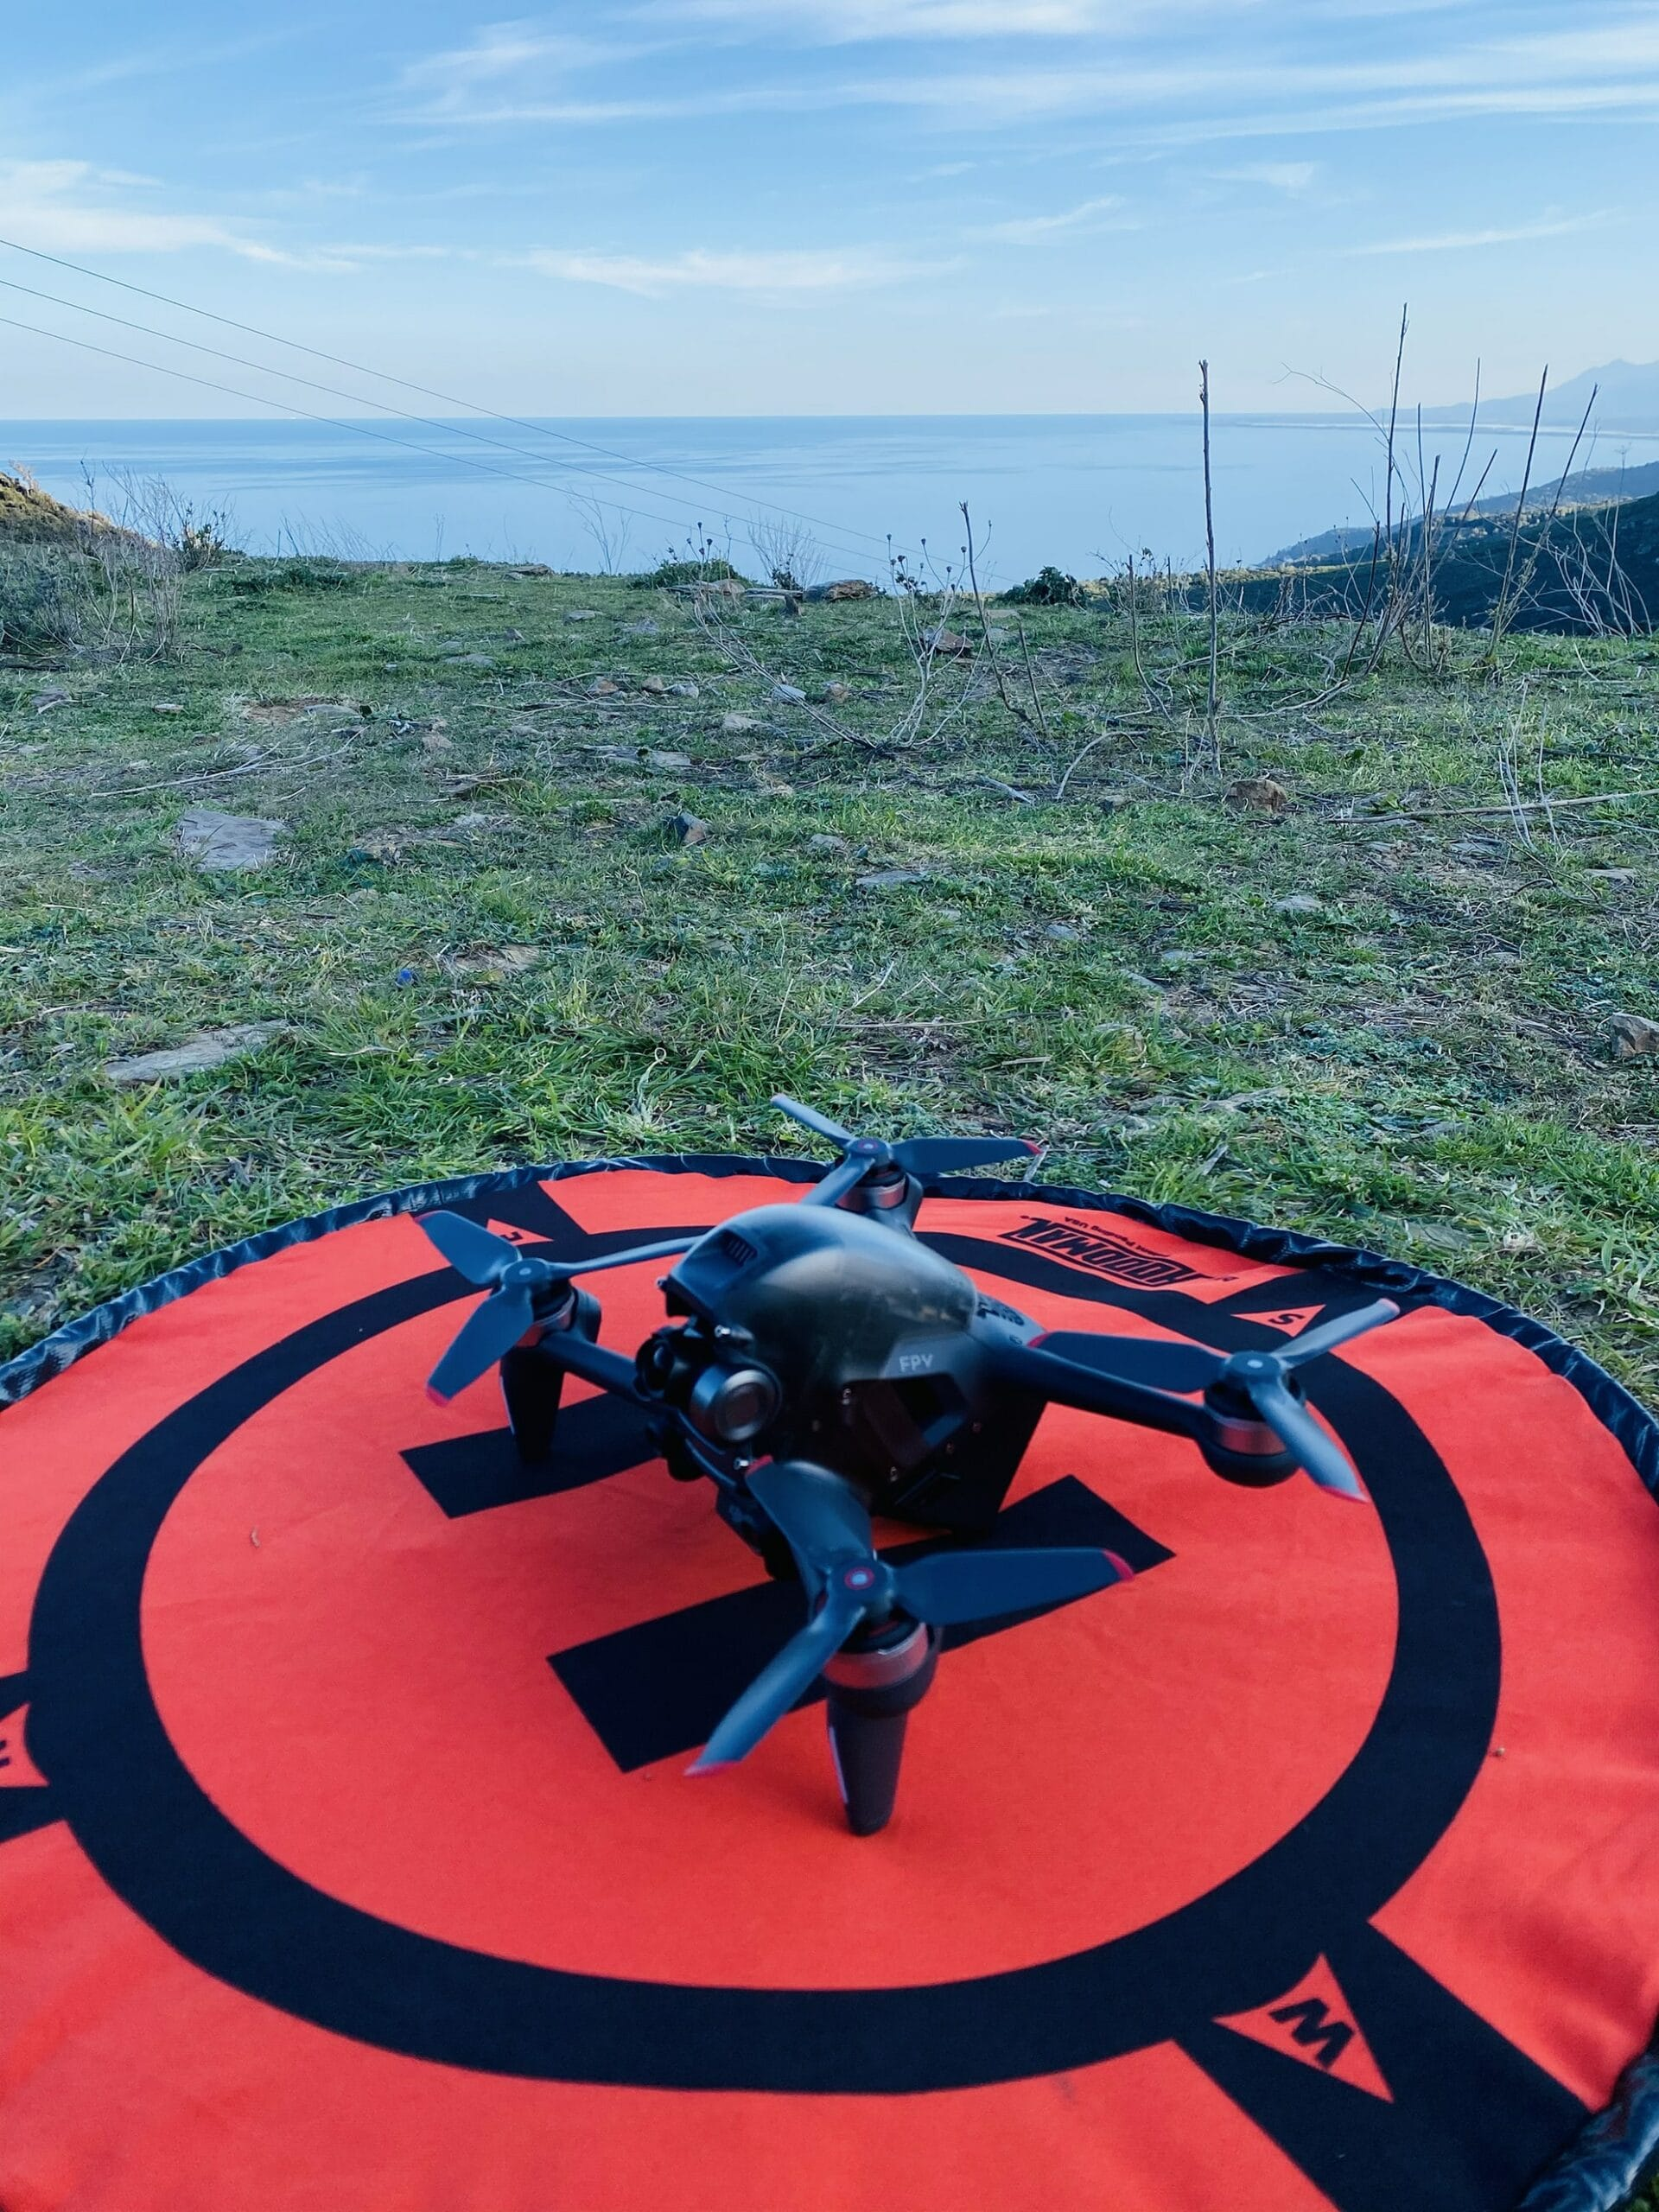 Dji-drone-fpv-min-scaled